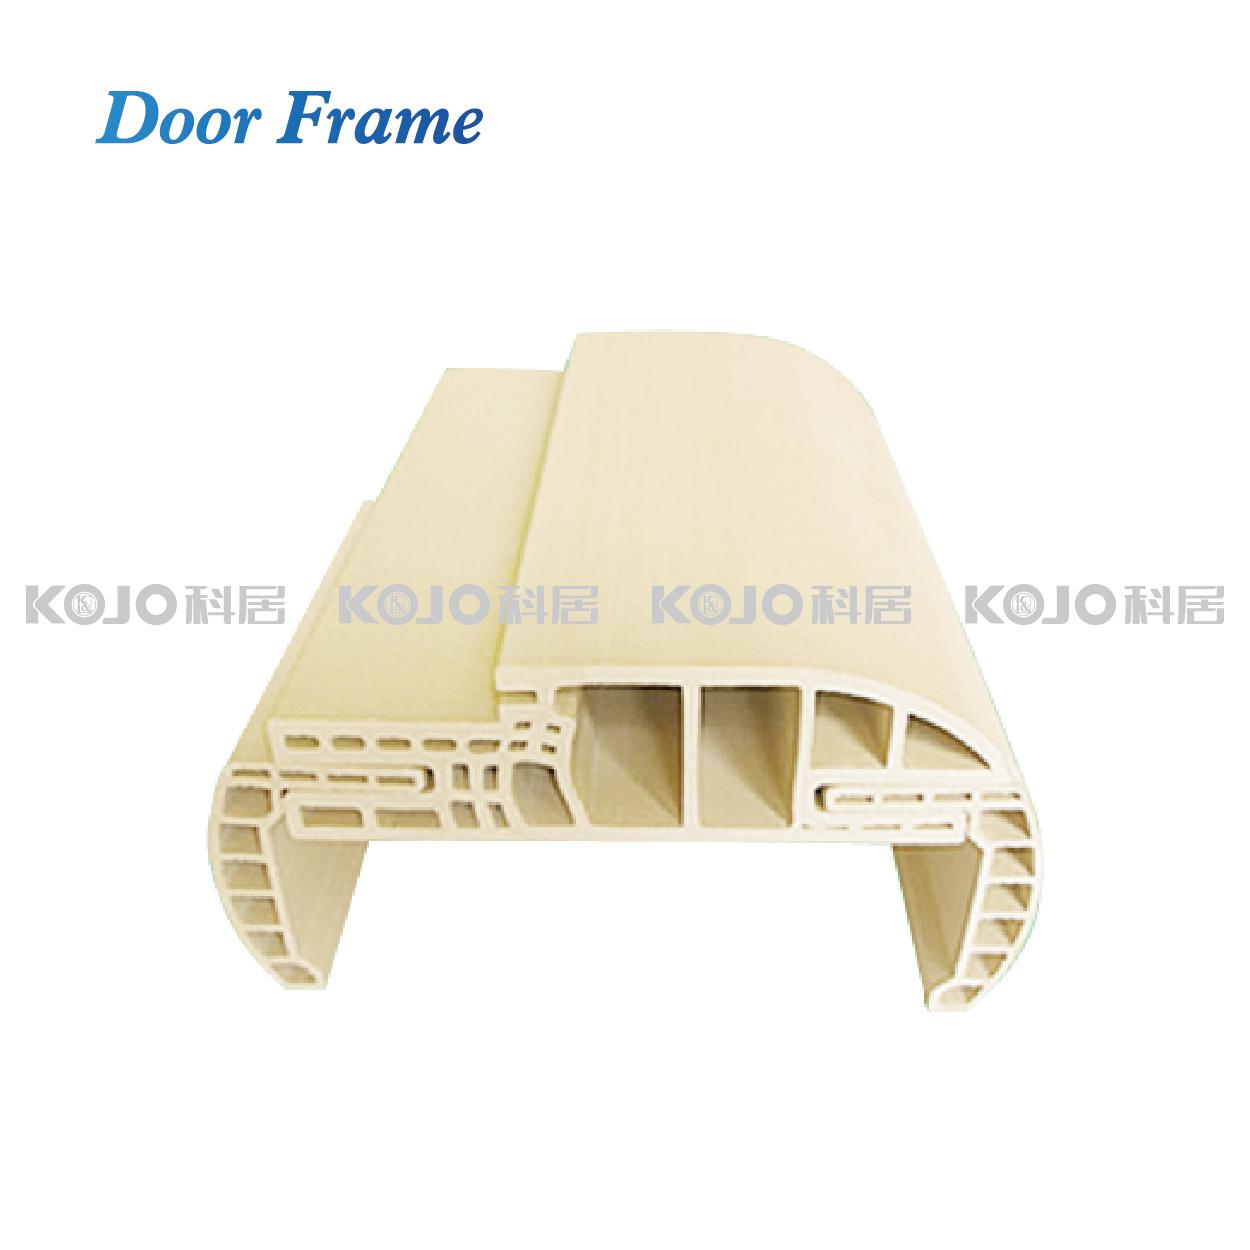 OEM/ODM Wood and Plastic Compostite Door Frame Architrave 5.8mm (MT-6018A)